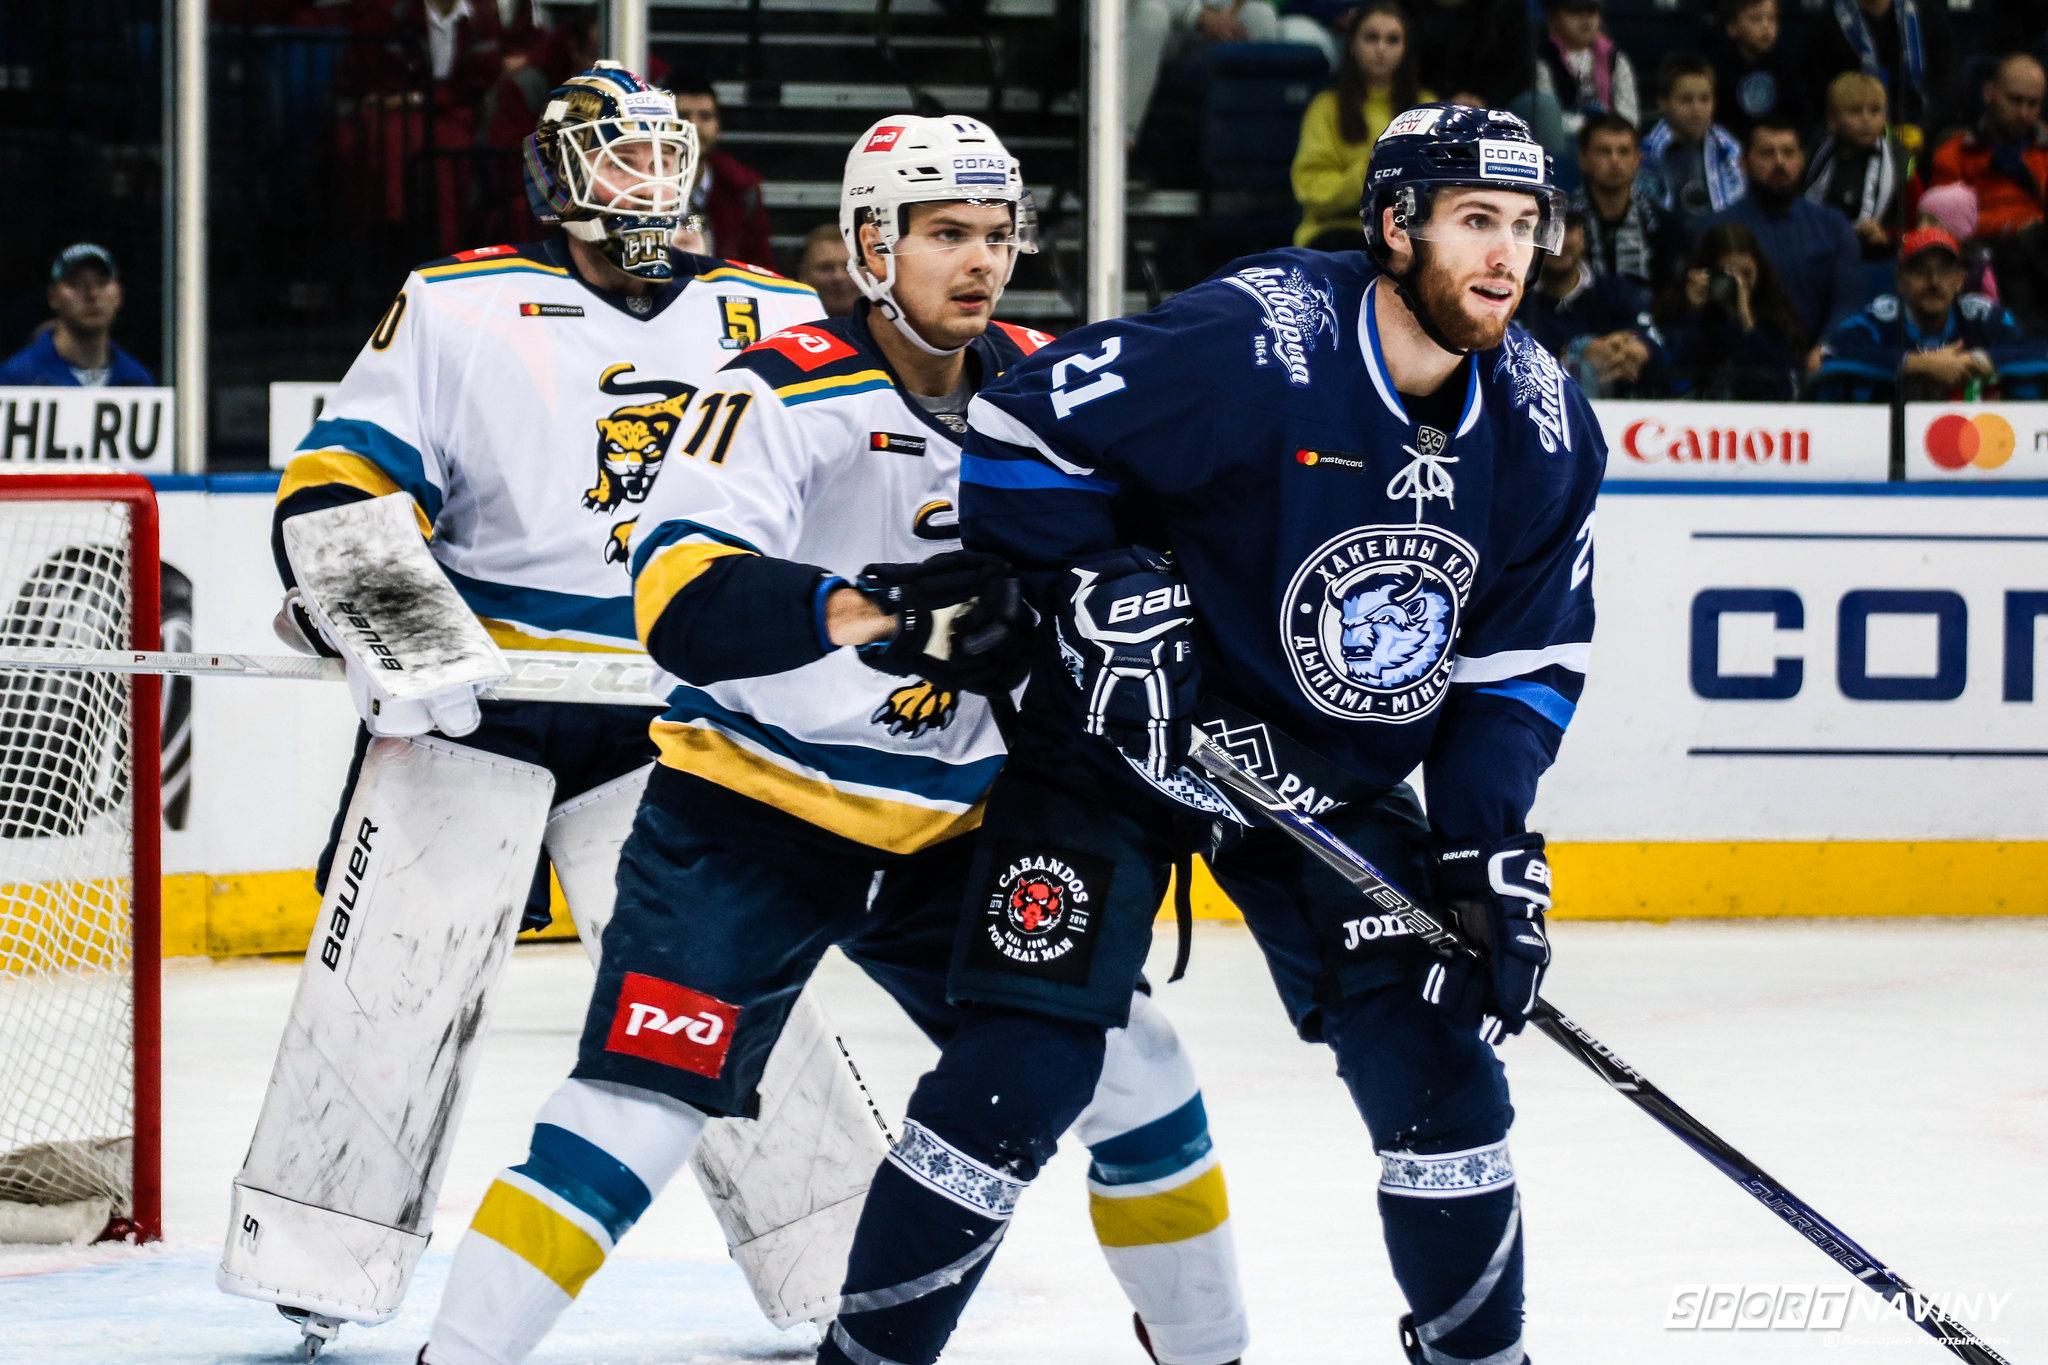 HC Dinamo-Minsk 1:3 HC Sochi. 14/09/2018